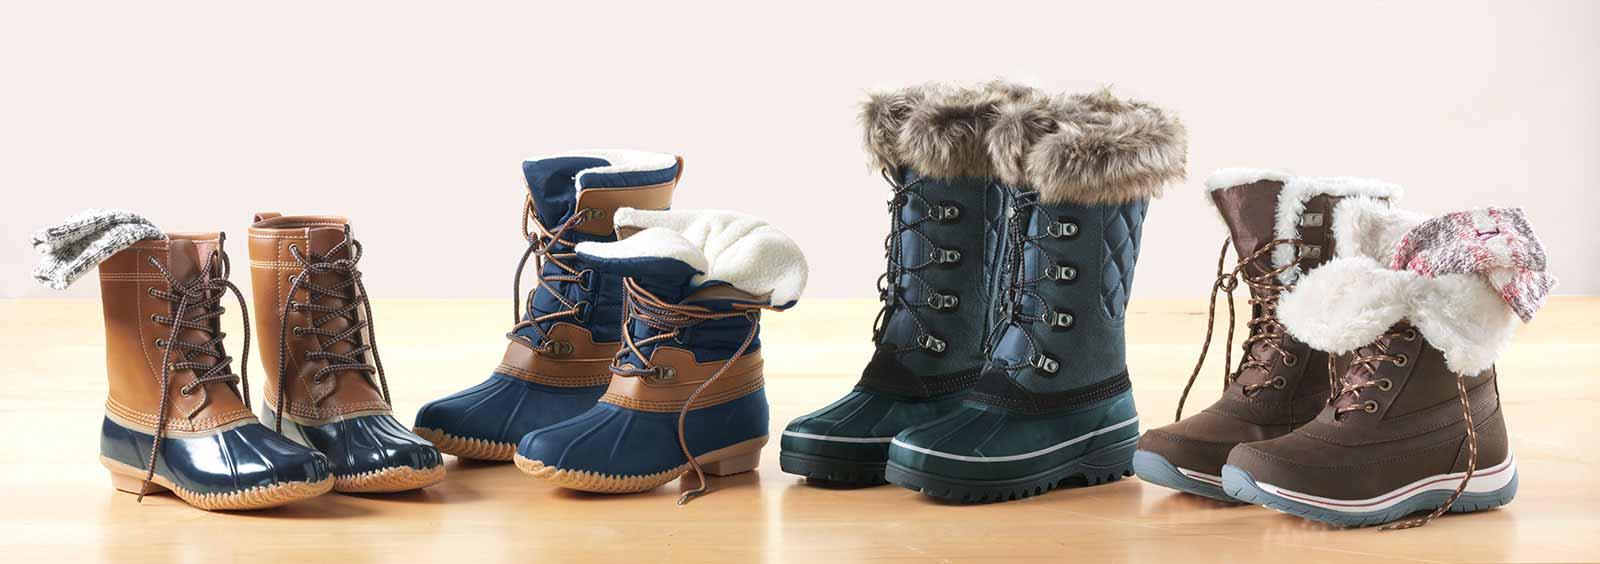 Snow Boots vs. Tennis Shoes: Best Winter Walking Shoes